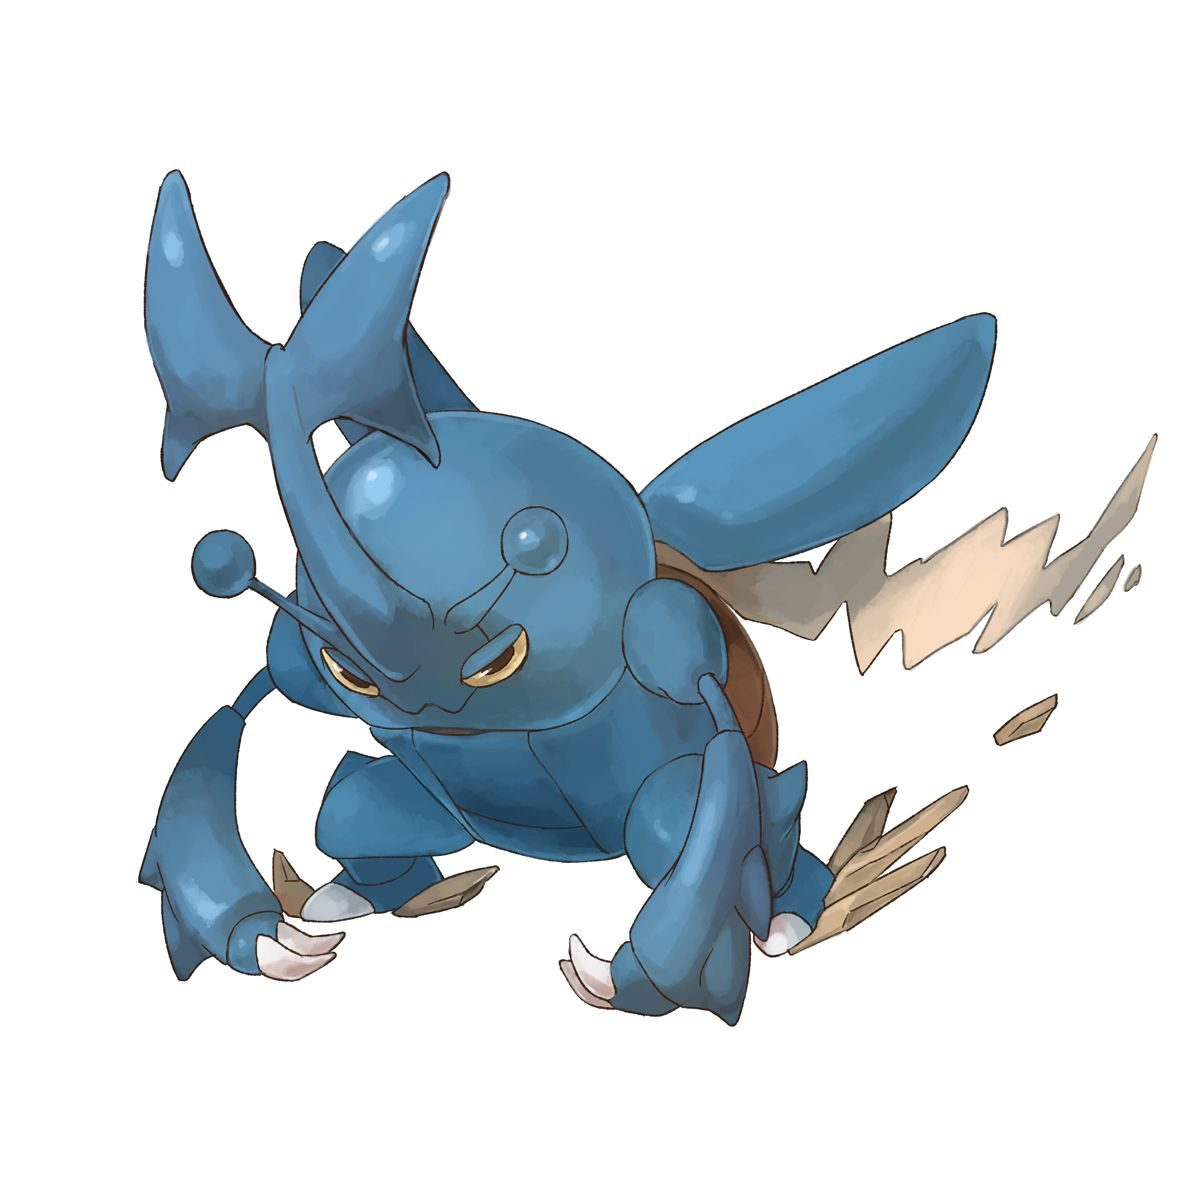 Heracross – Pokémon – Zerochan Anime Image Board